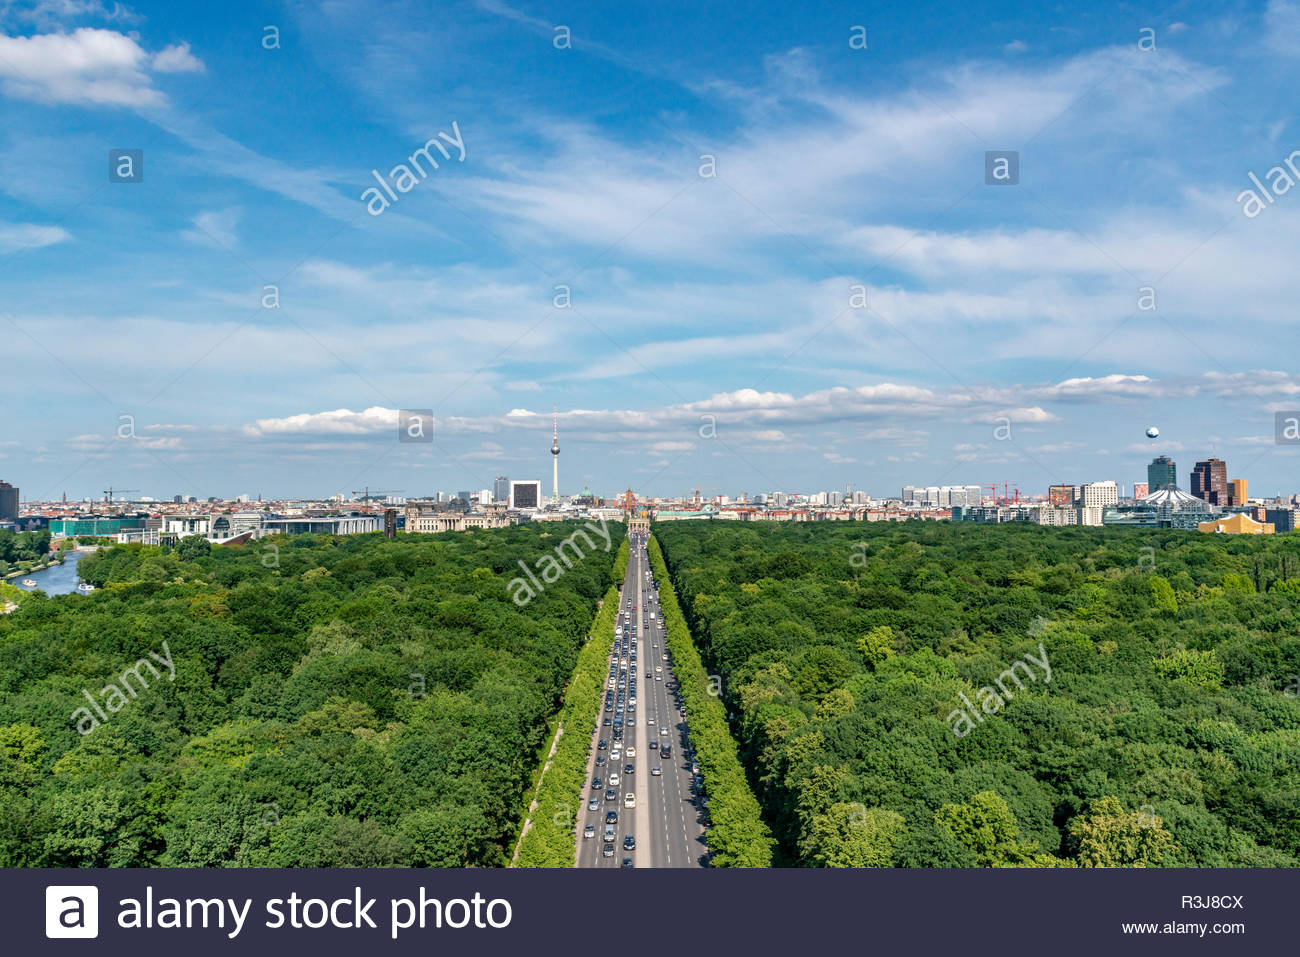 Berlin Mitte Luftbildaufnahme - Stock Image